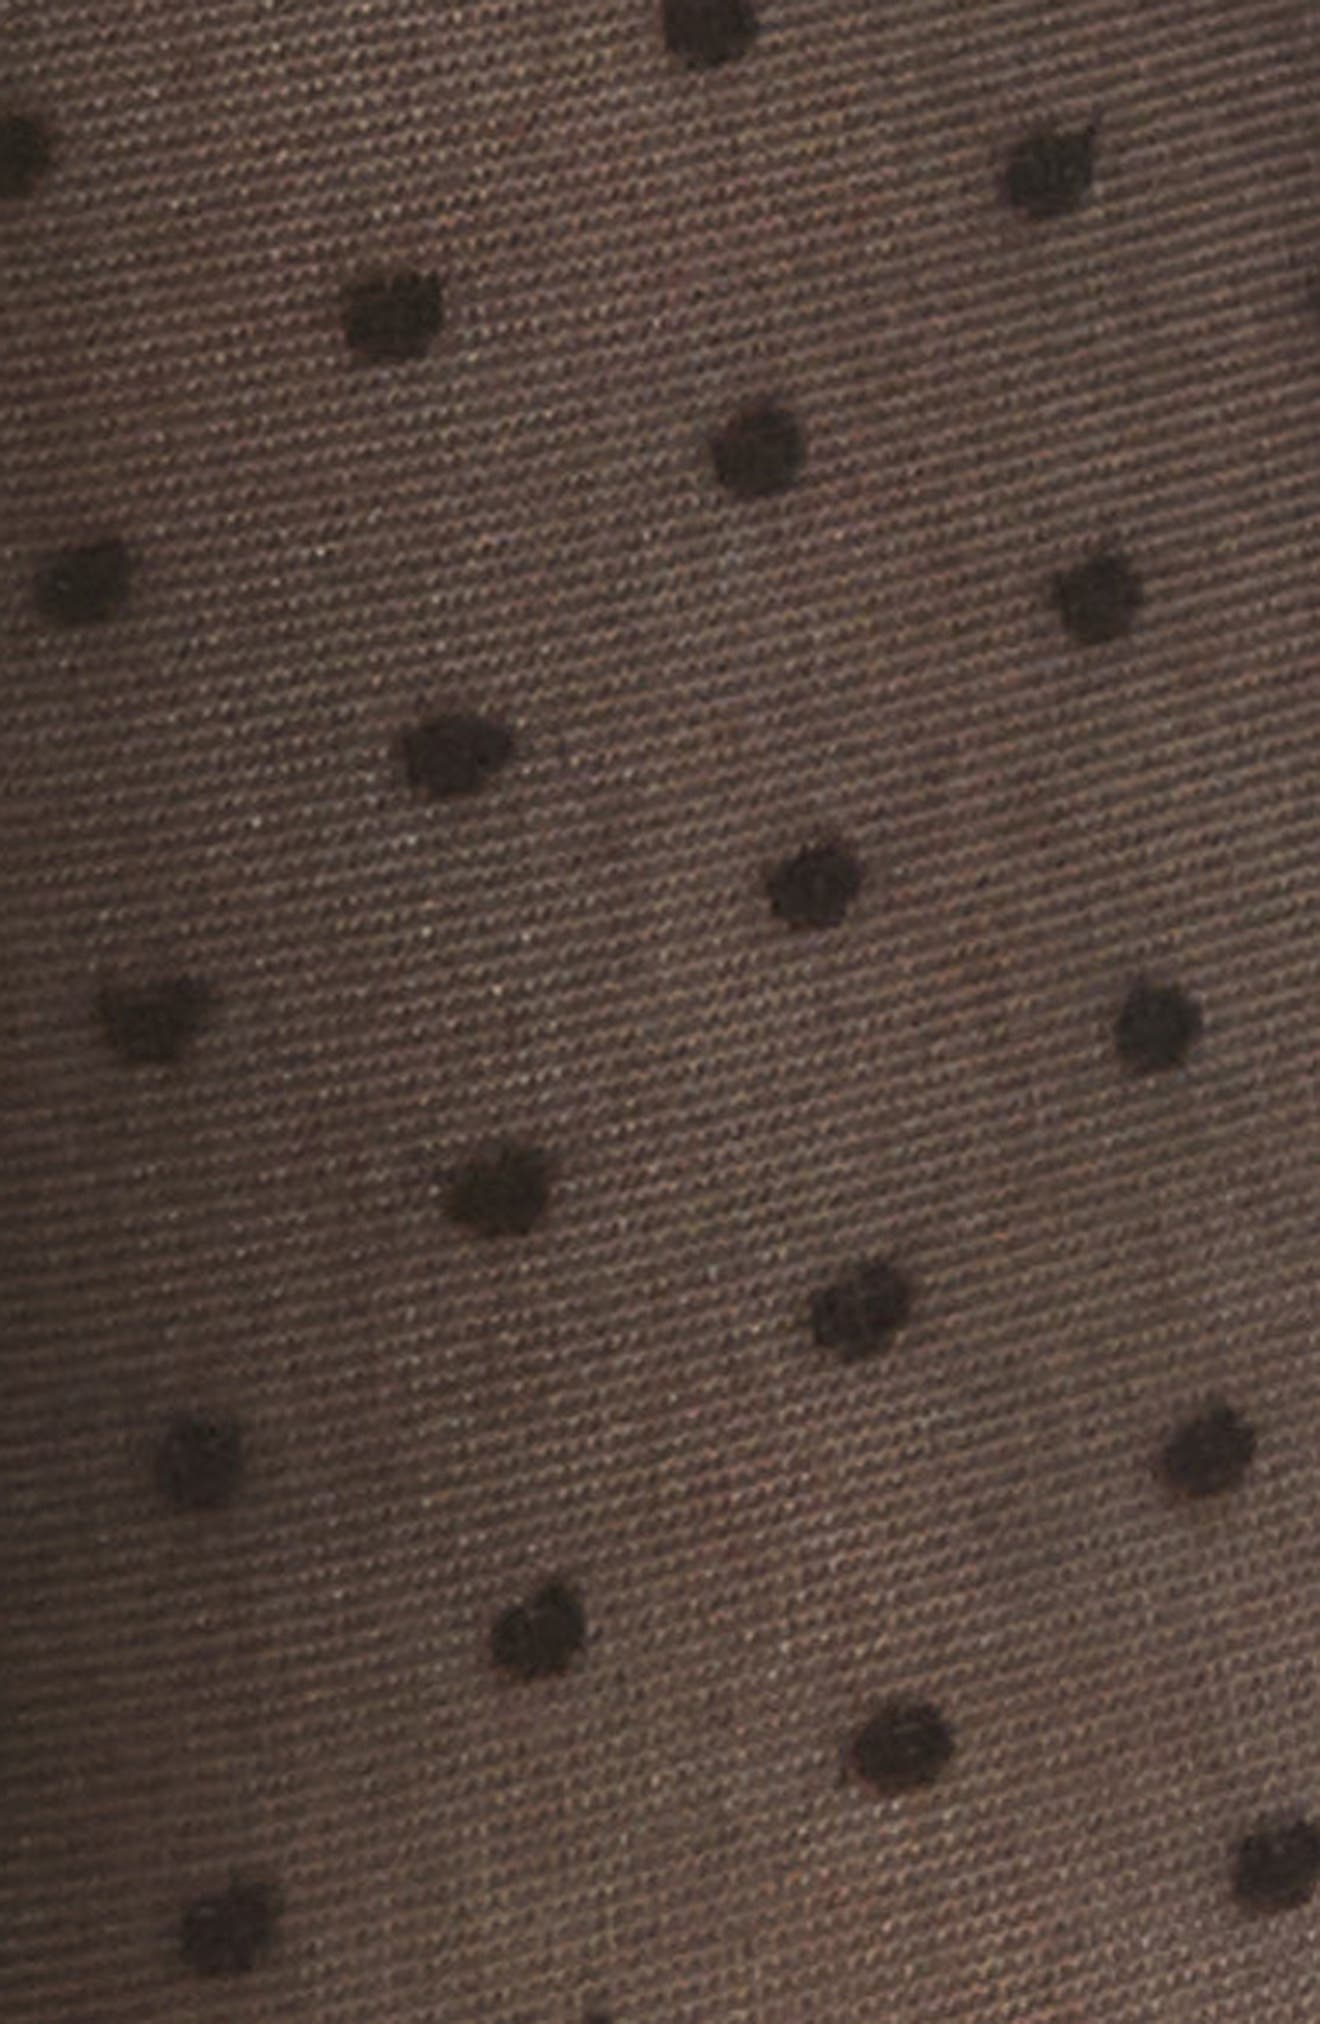 Sarah Jessica Sheer Socks,                             Alternate thumbnail 2, color,                             Black